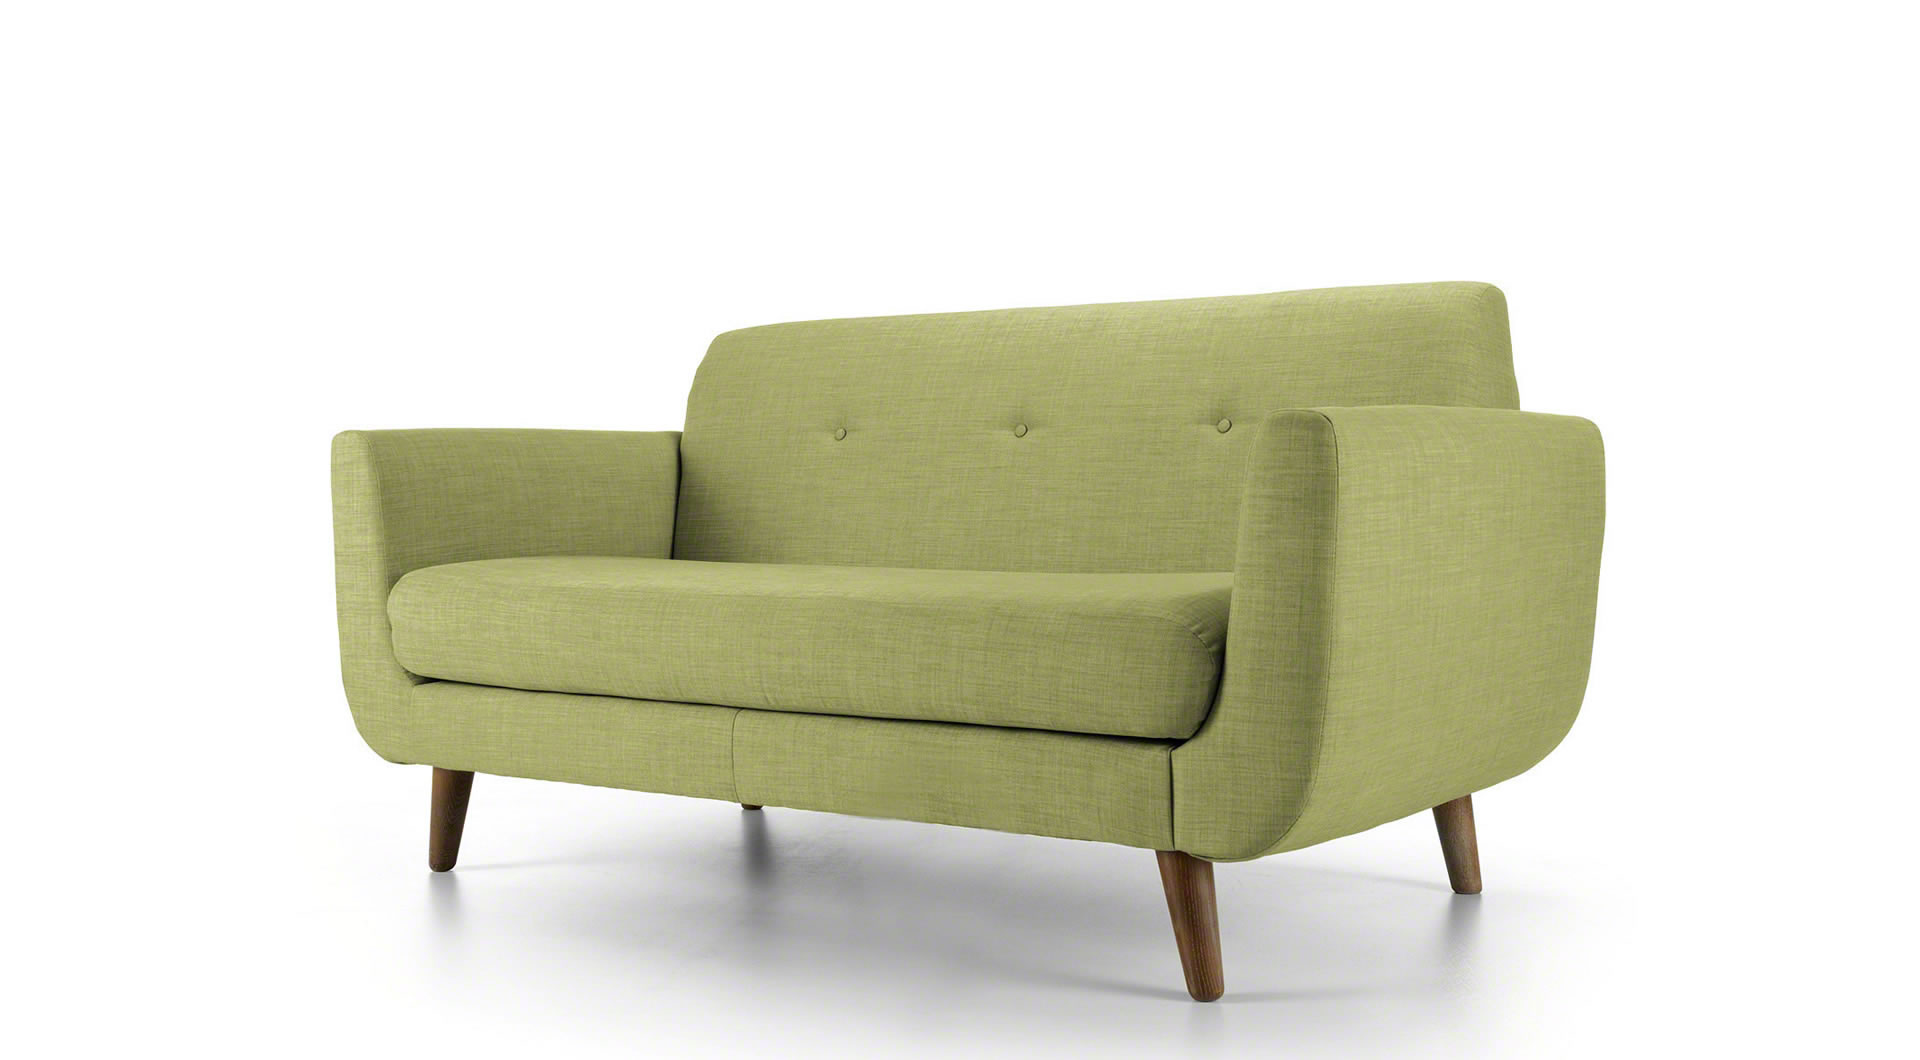 lime sofa uk ashley furniture white madeline 3 seater mysmallspace